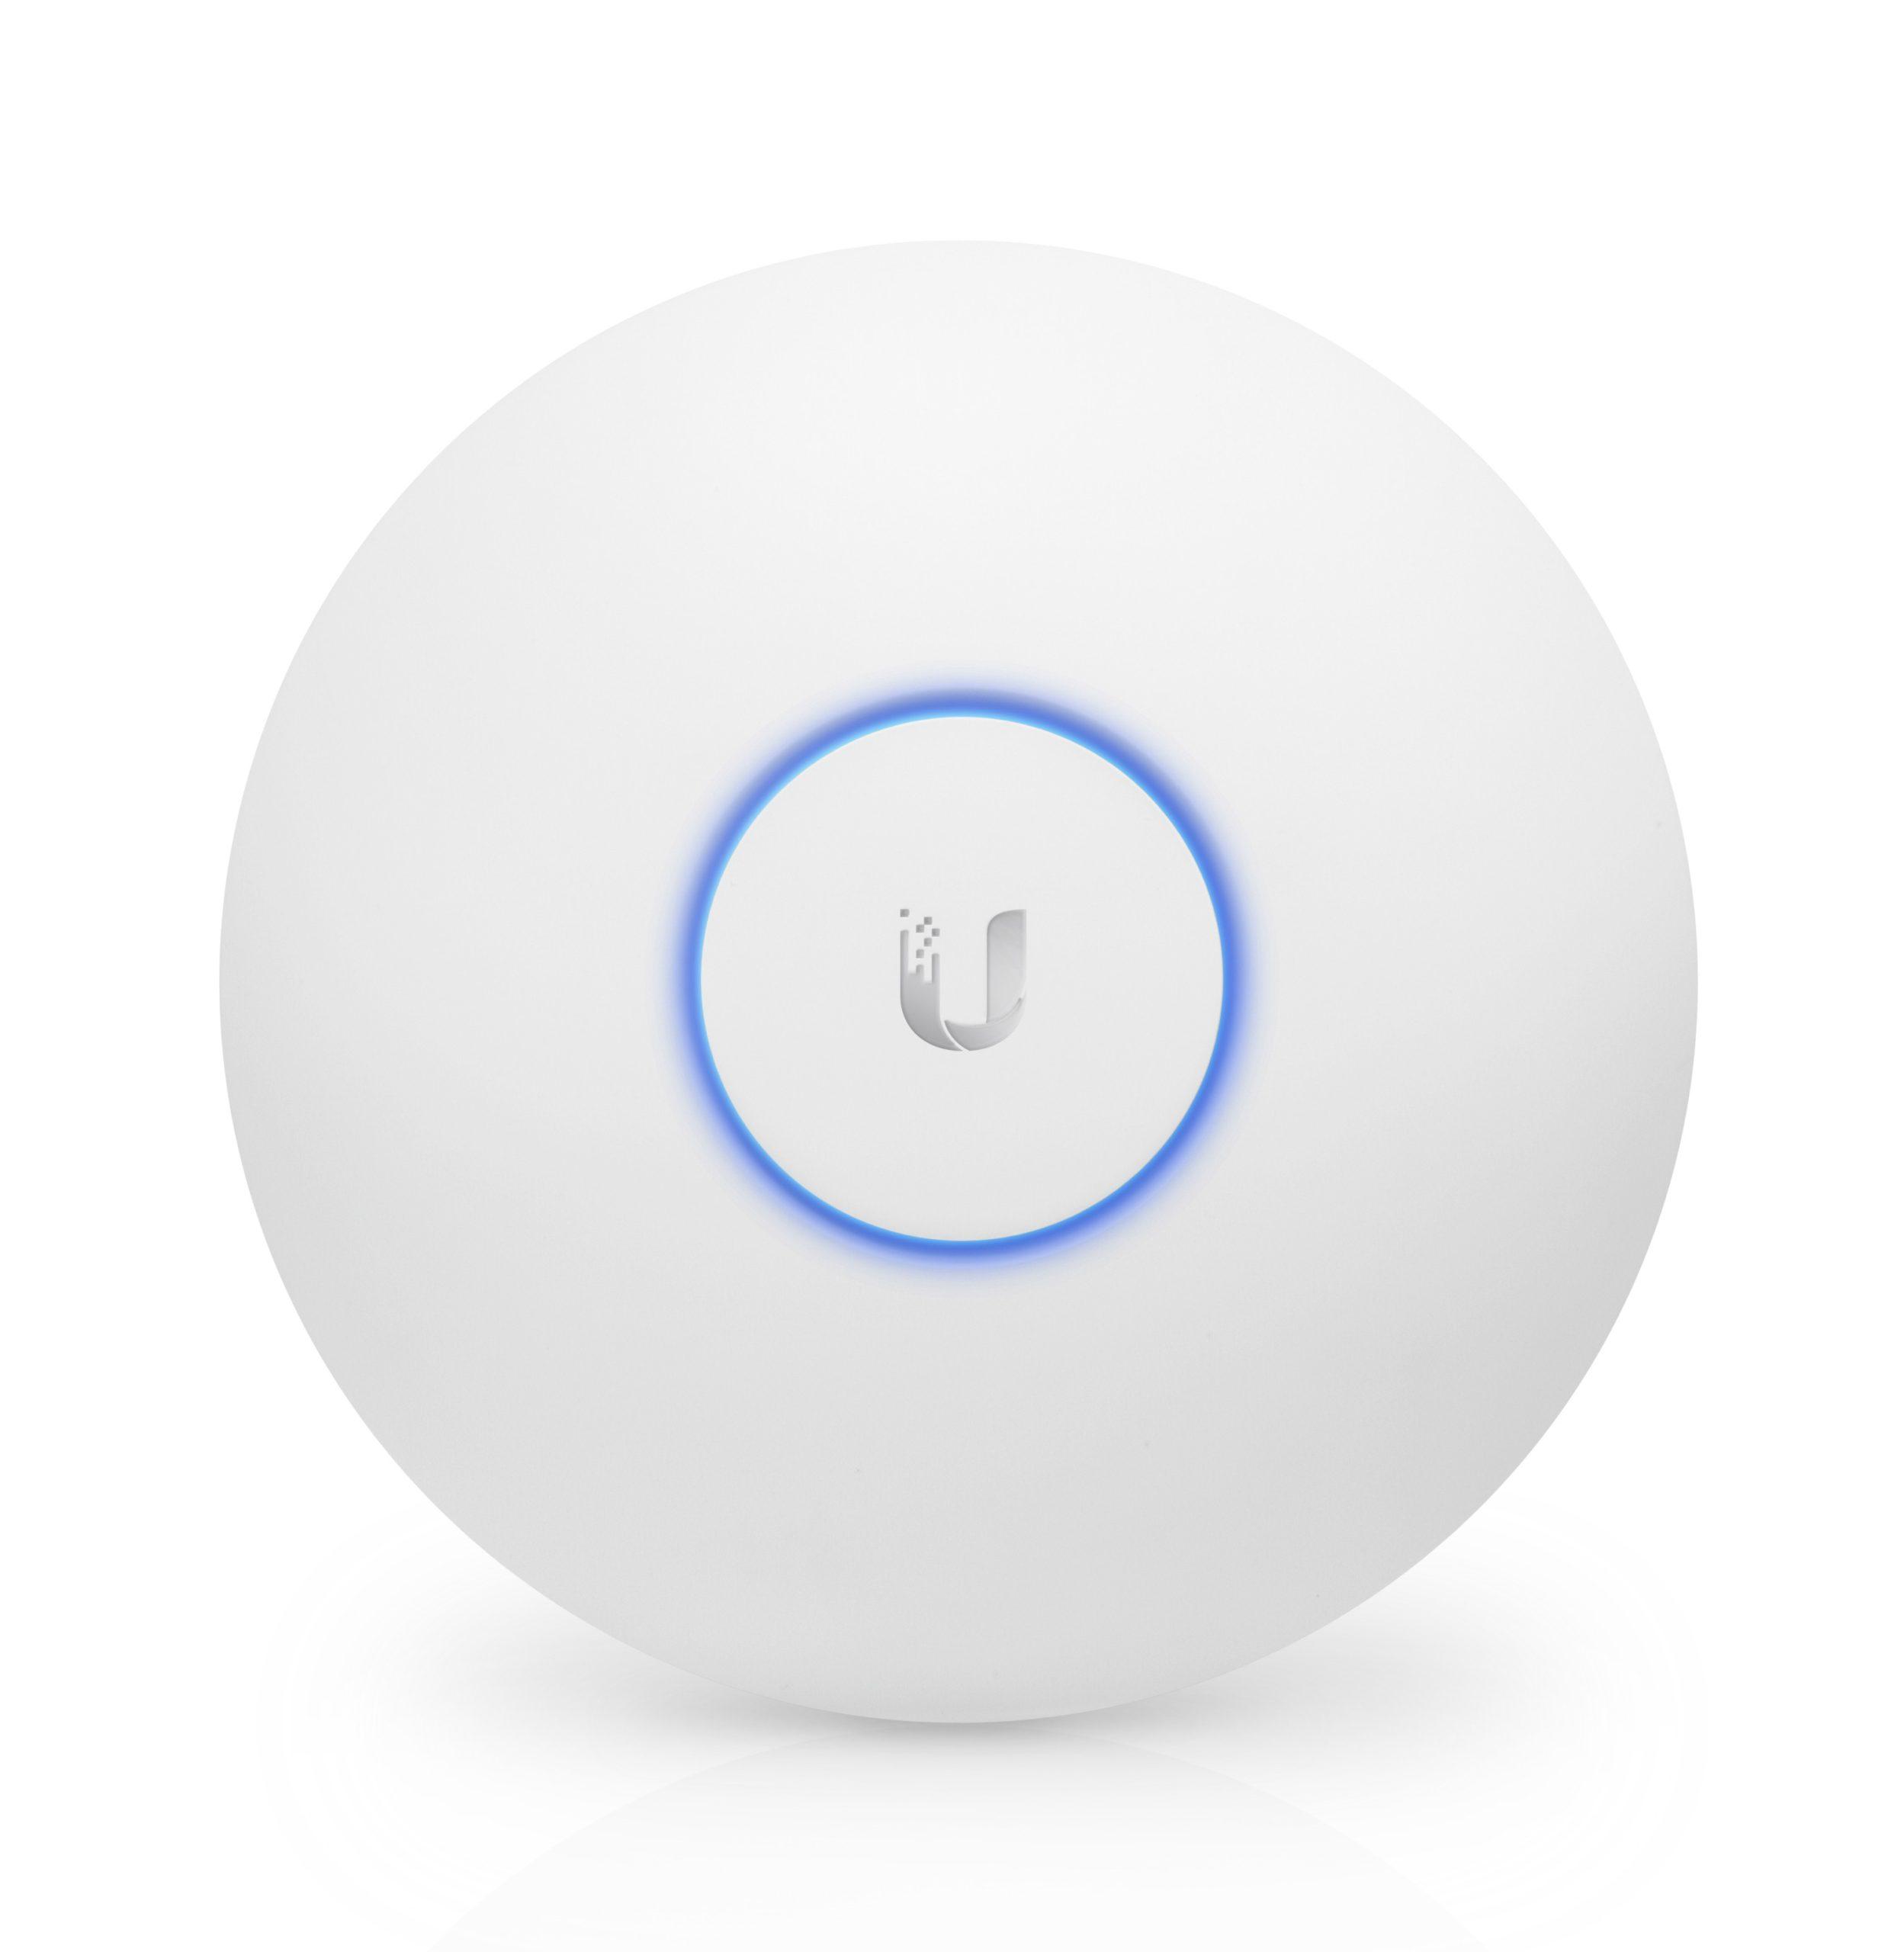 UAP-AC-LITE Access Point Ubiquiti LITE UniFi doble banda 802.11ac 360° MIMO 2X2 para interior PoE 802.3af, hasta 100 usuarios Wi-Fi